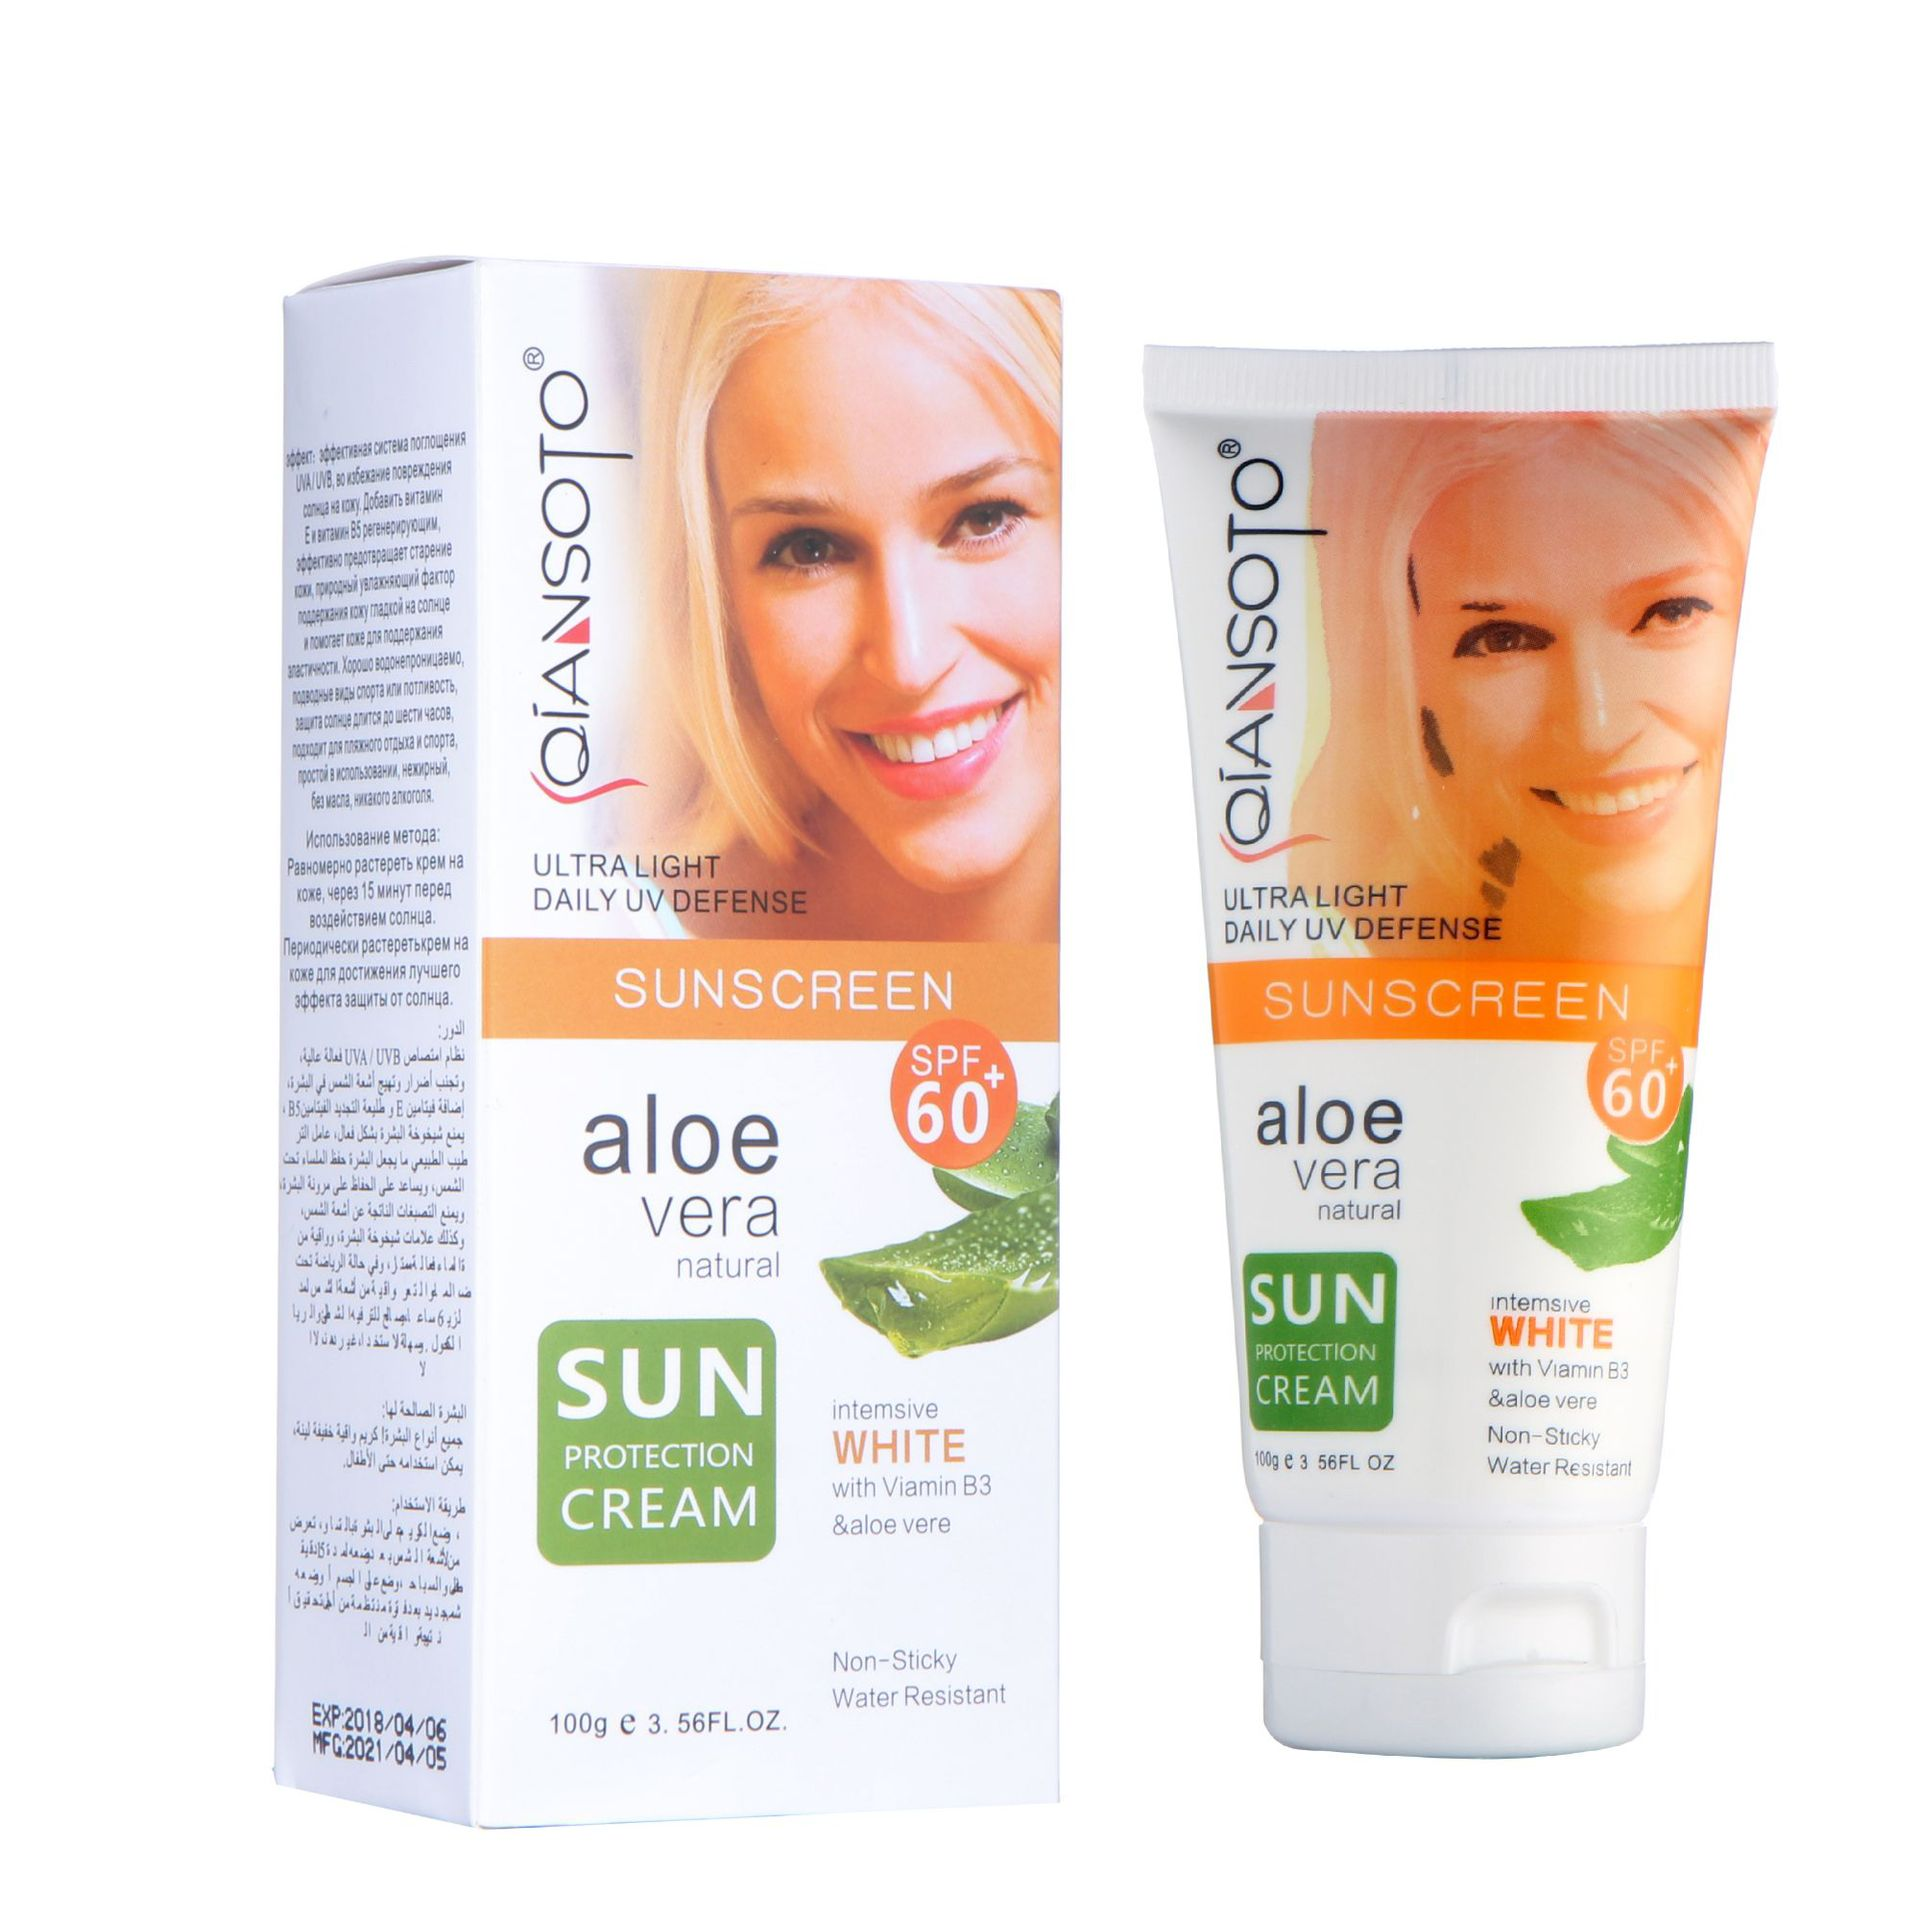 100ml Beauty Skin Care Aloe Facial Sunscreen Cream Spf Oil Free Radical Scavenger Anti Oxidant Control Skin Care Products